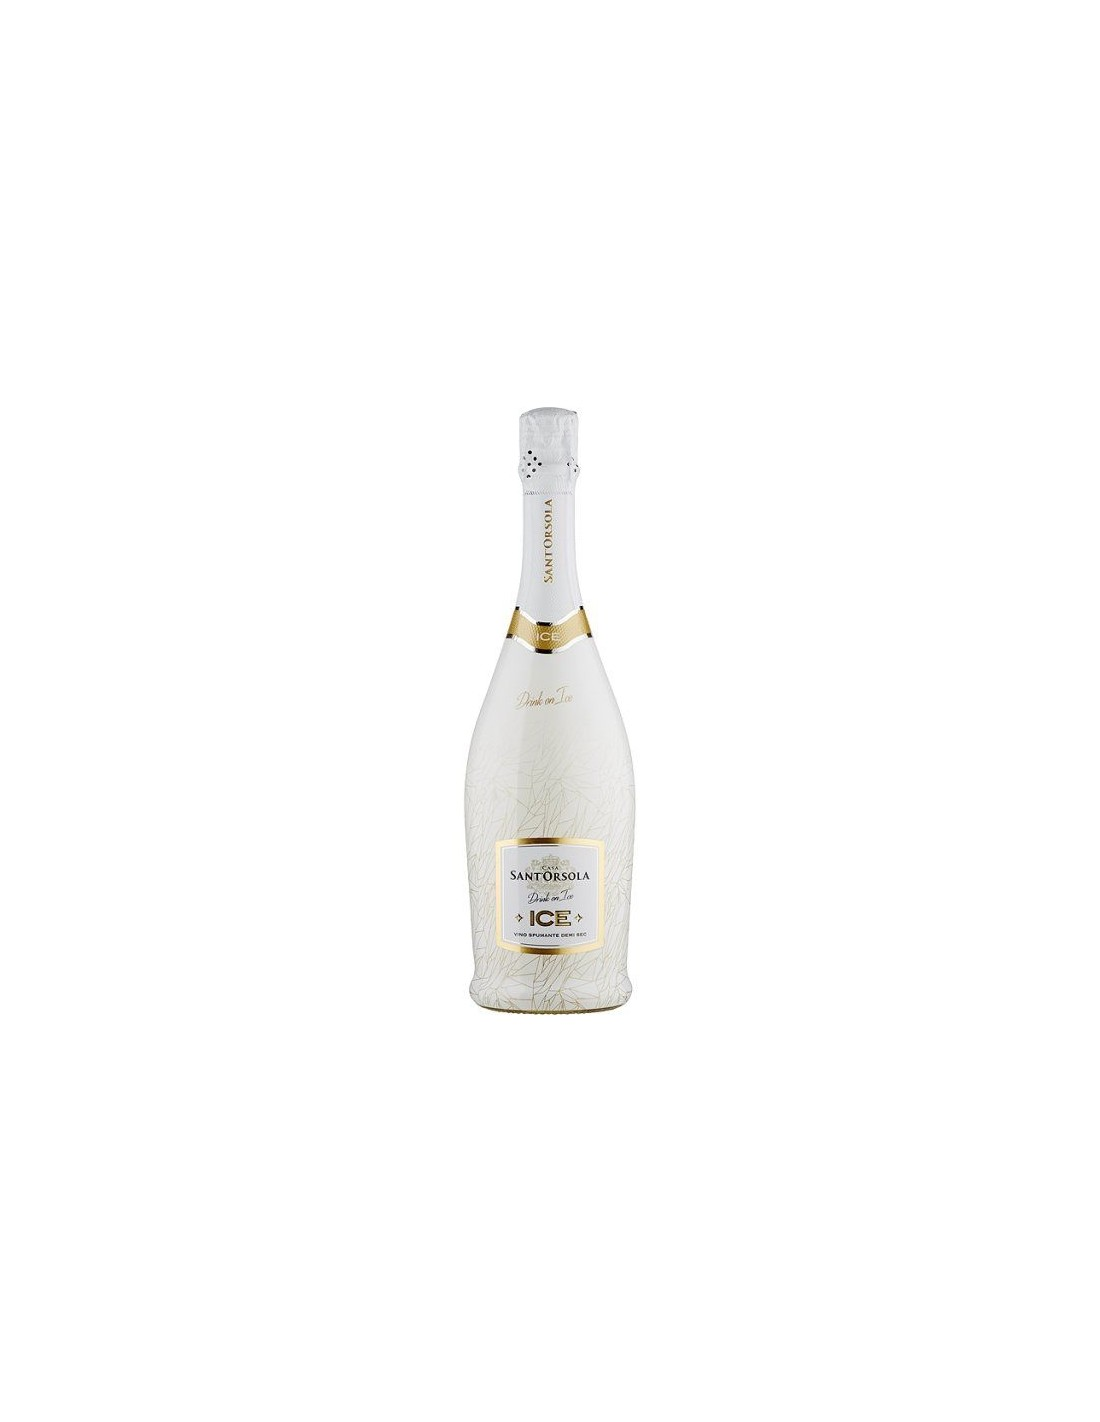 Vin spumant alb Cupaj, Casa Sant'Orsola Ice, 0.75L, 11% alc., Italia